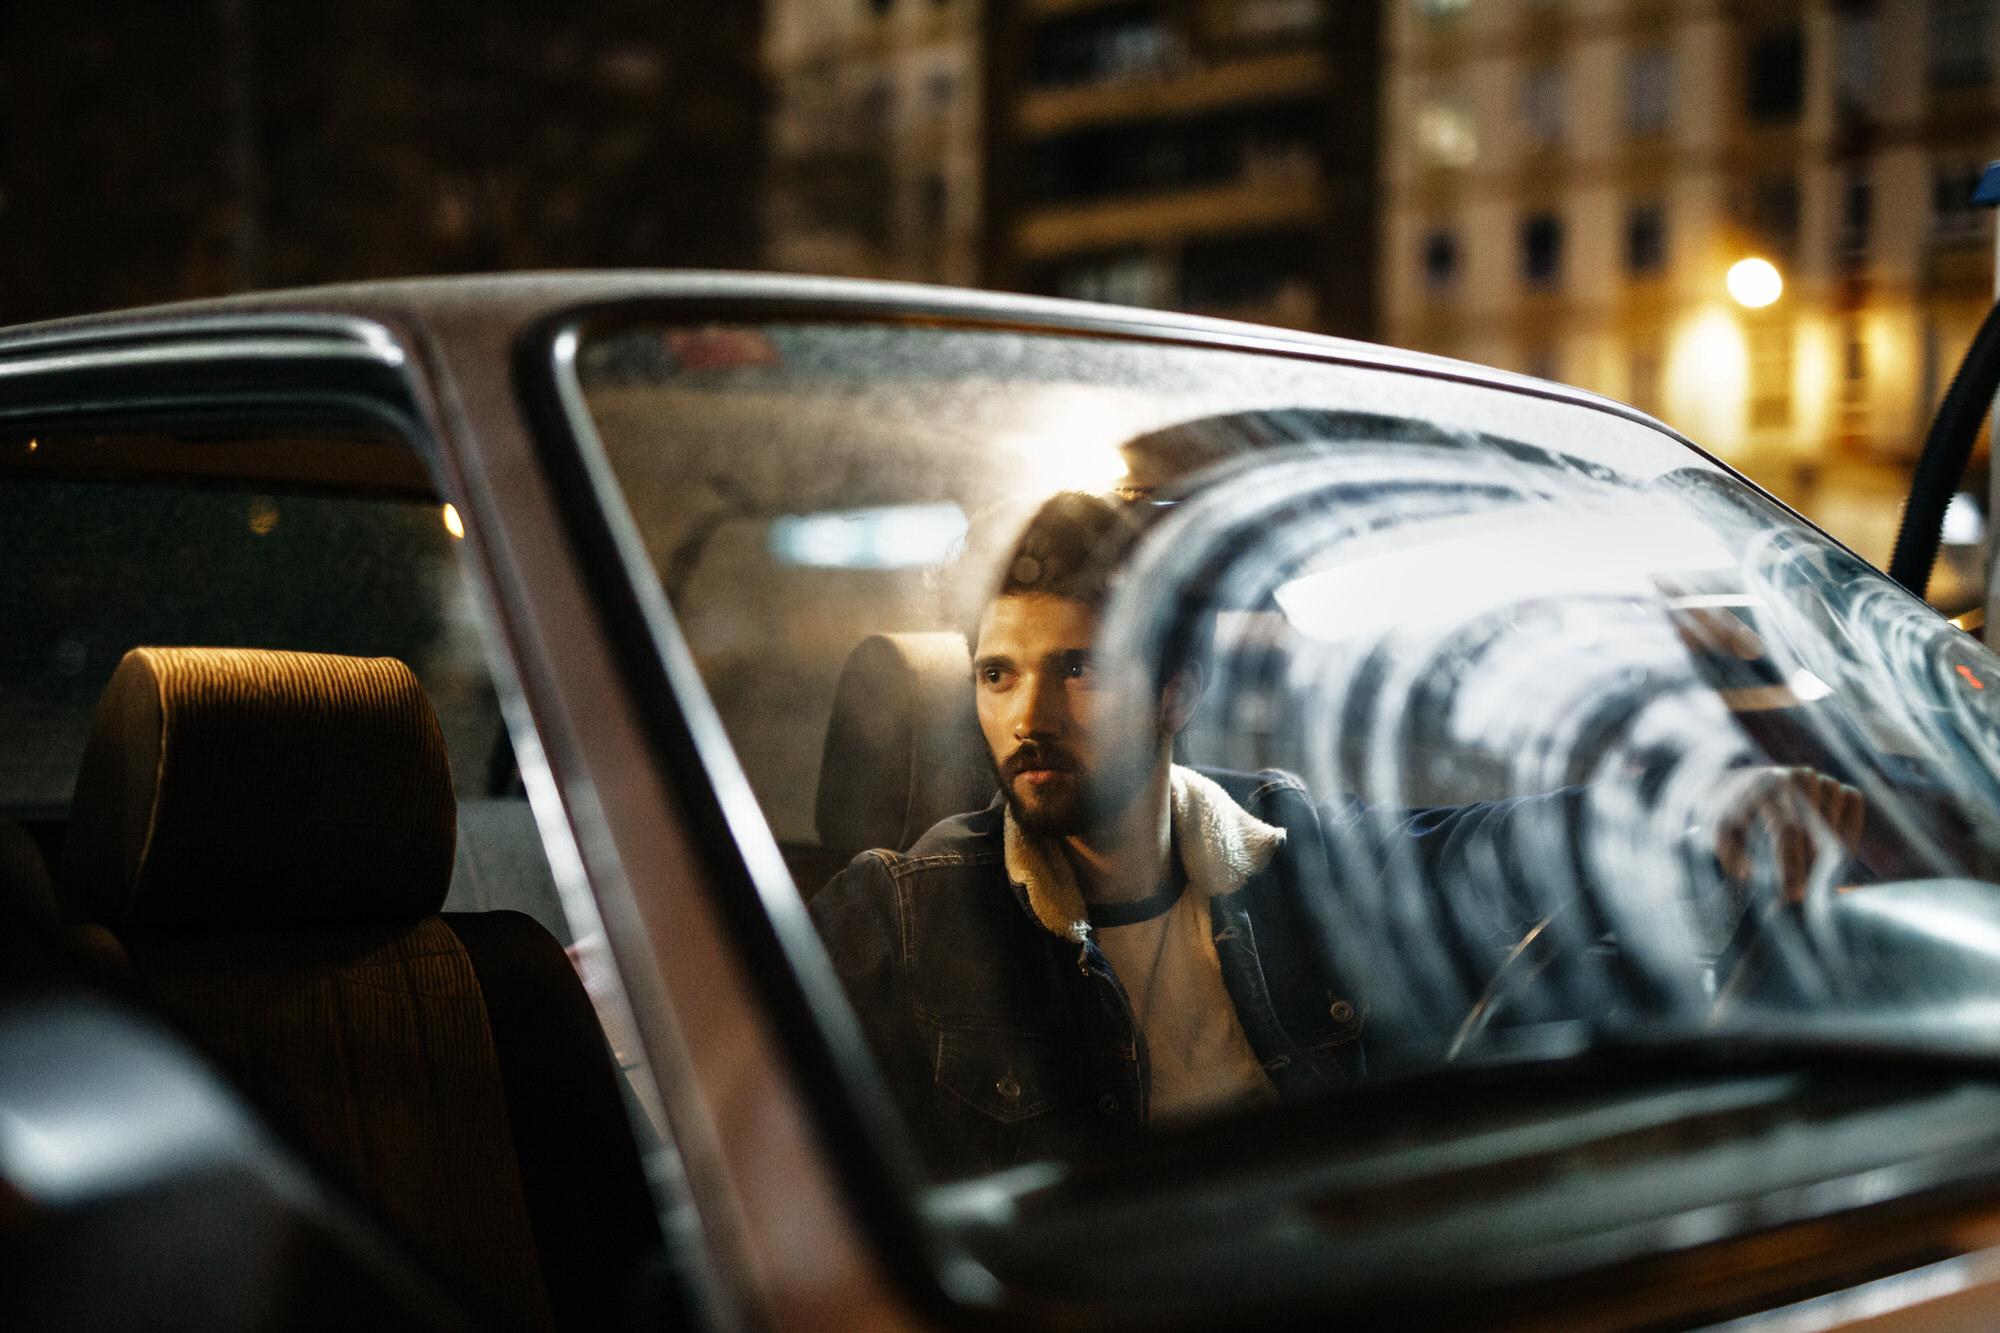 freelance-advertising-commercial-photographer-based-in-barcelona-4